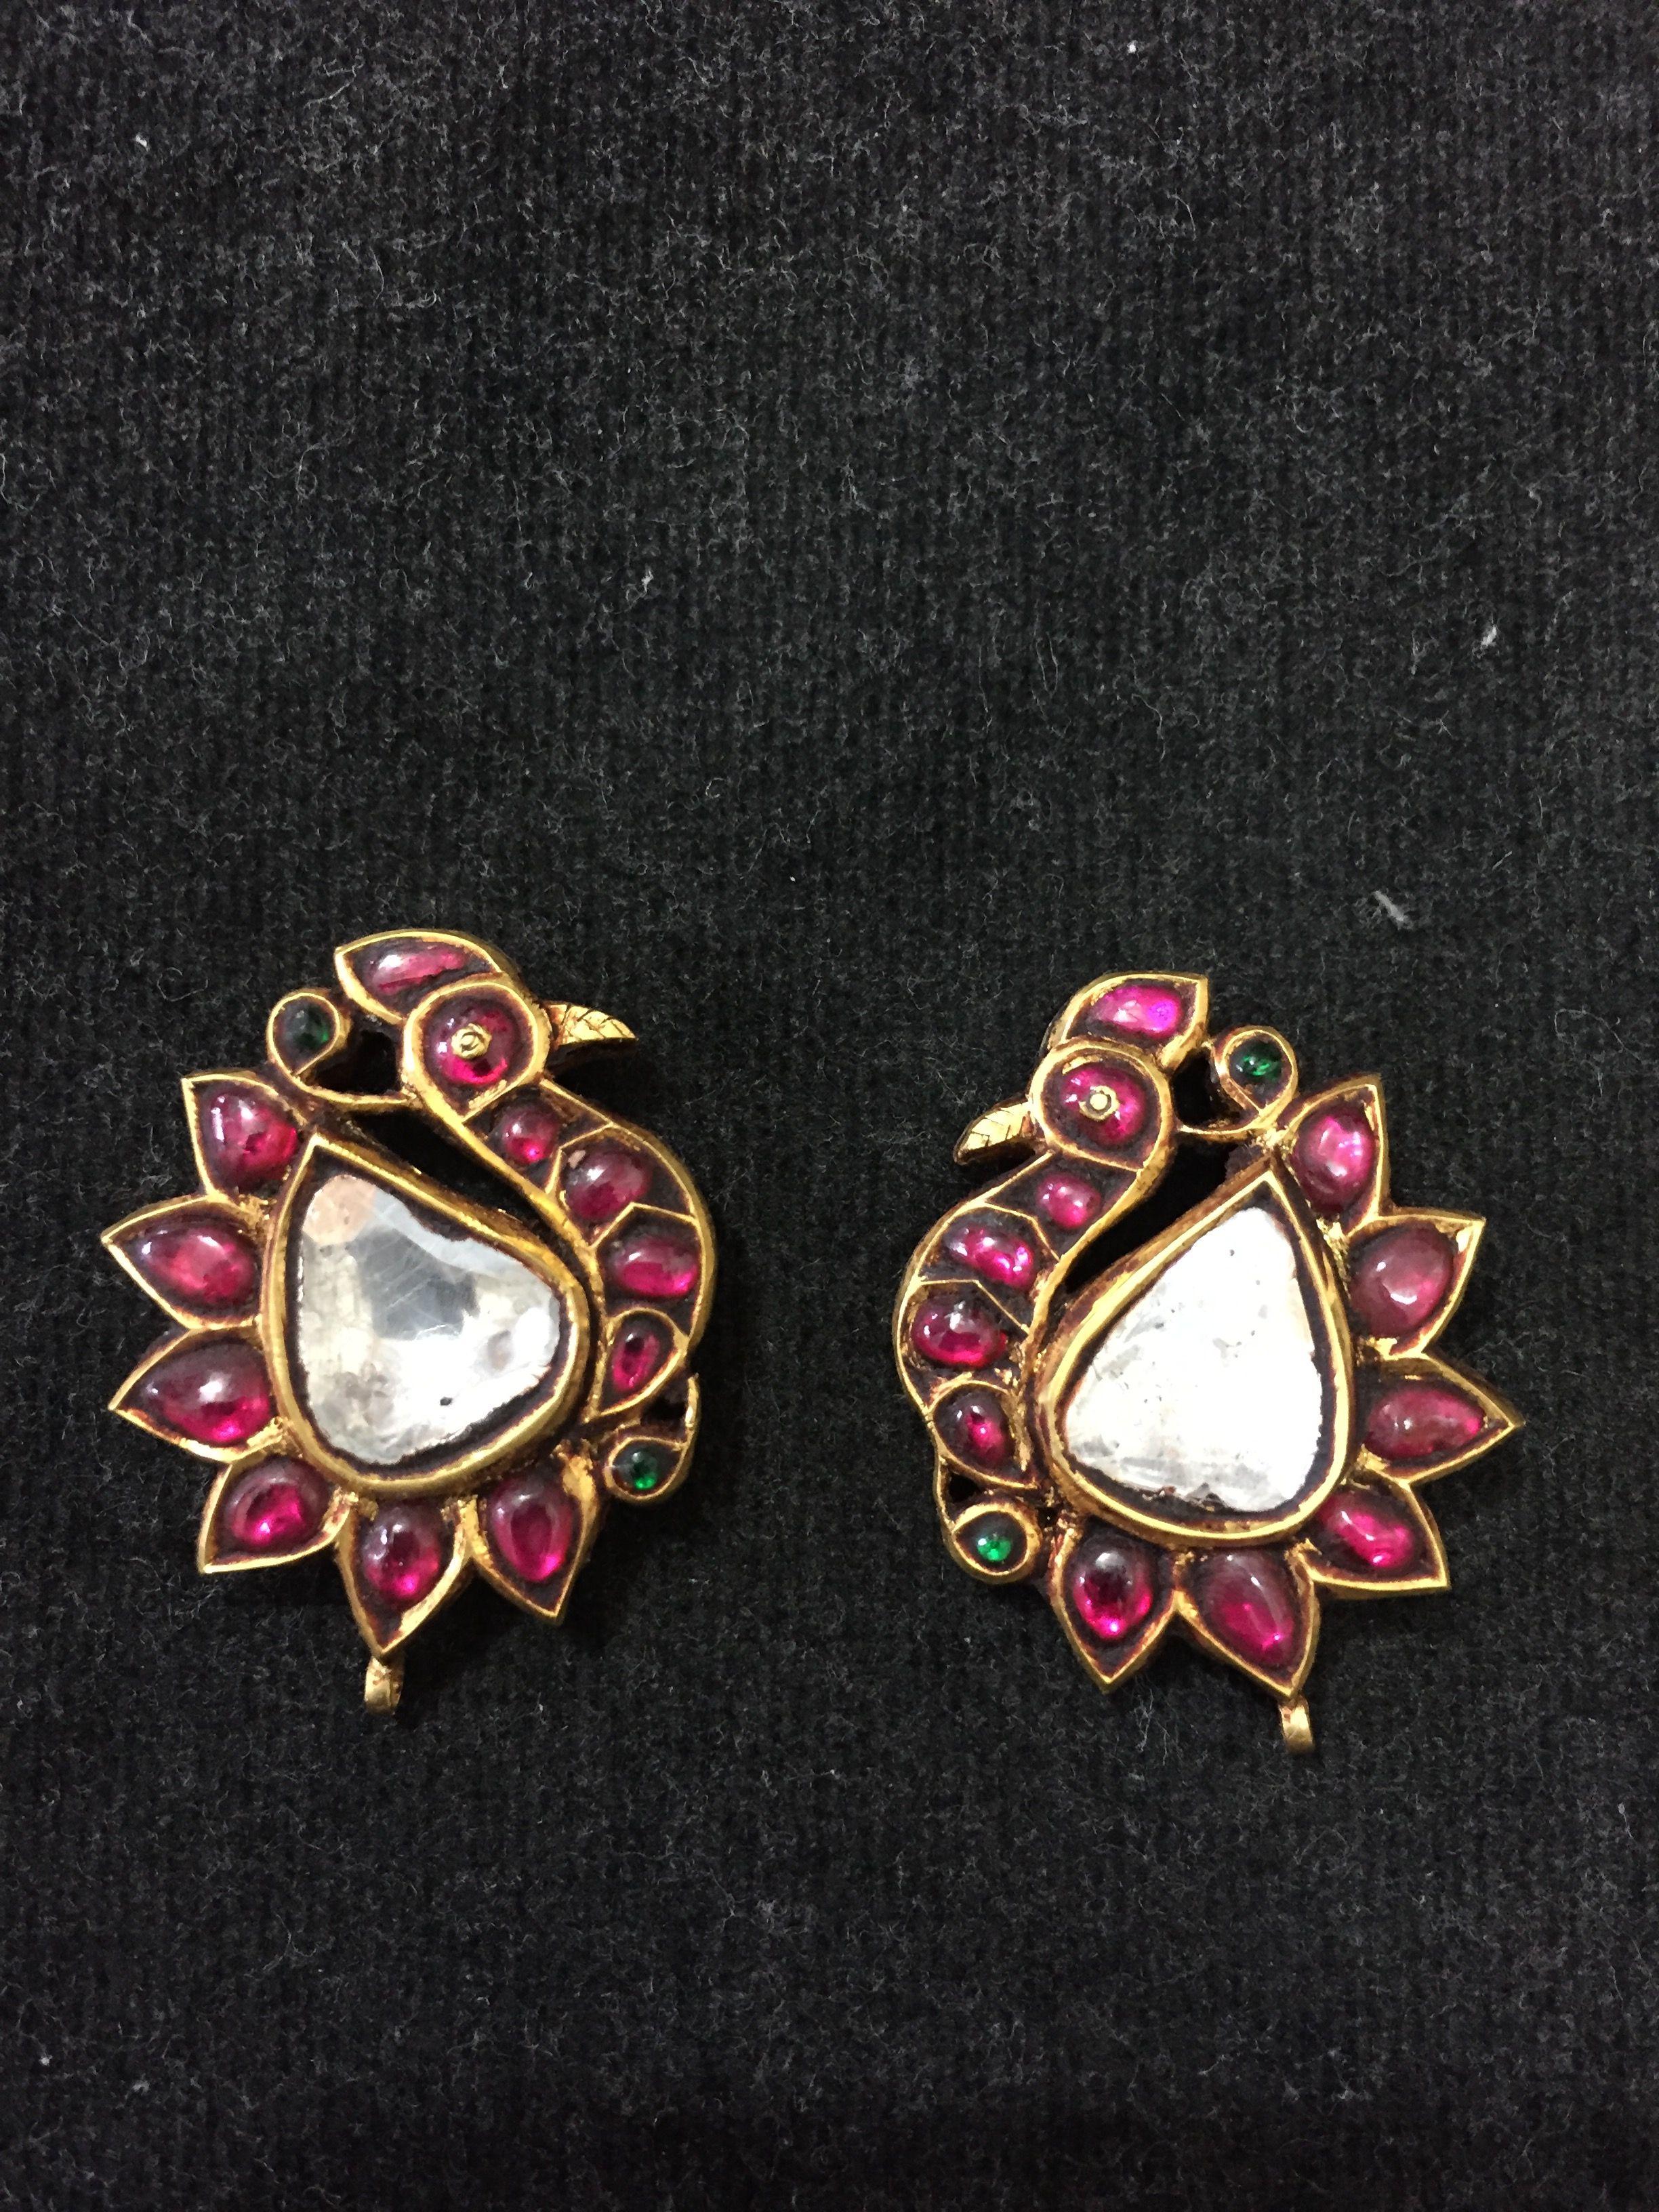 Bird design earings, rubies with uncut diamonds in gold